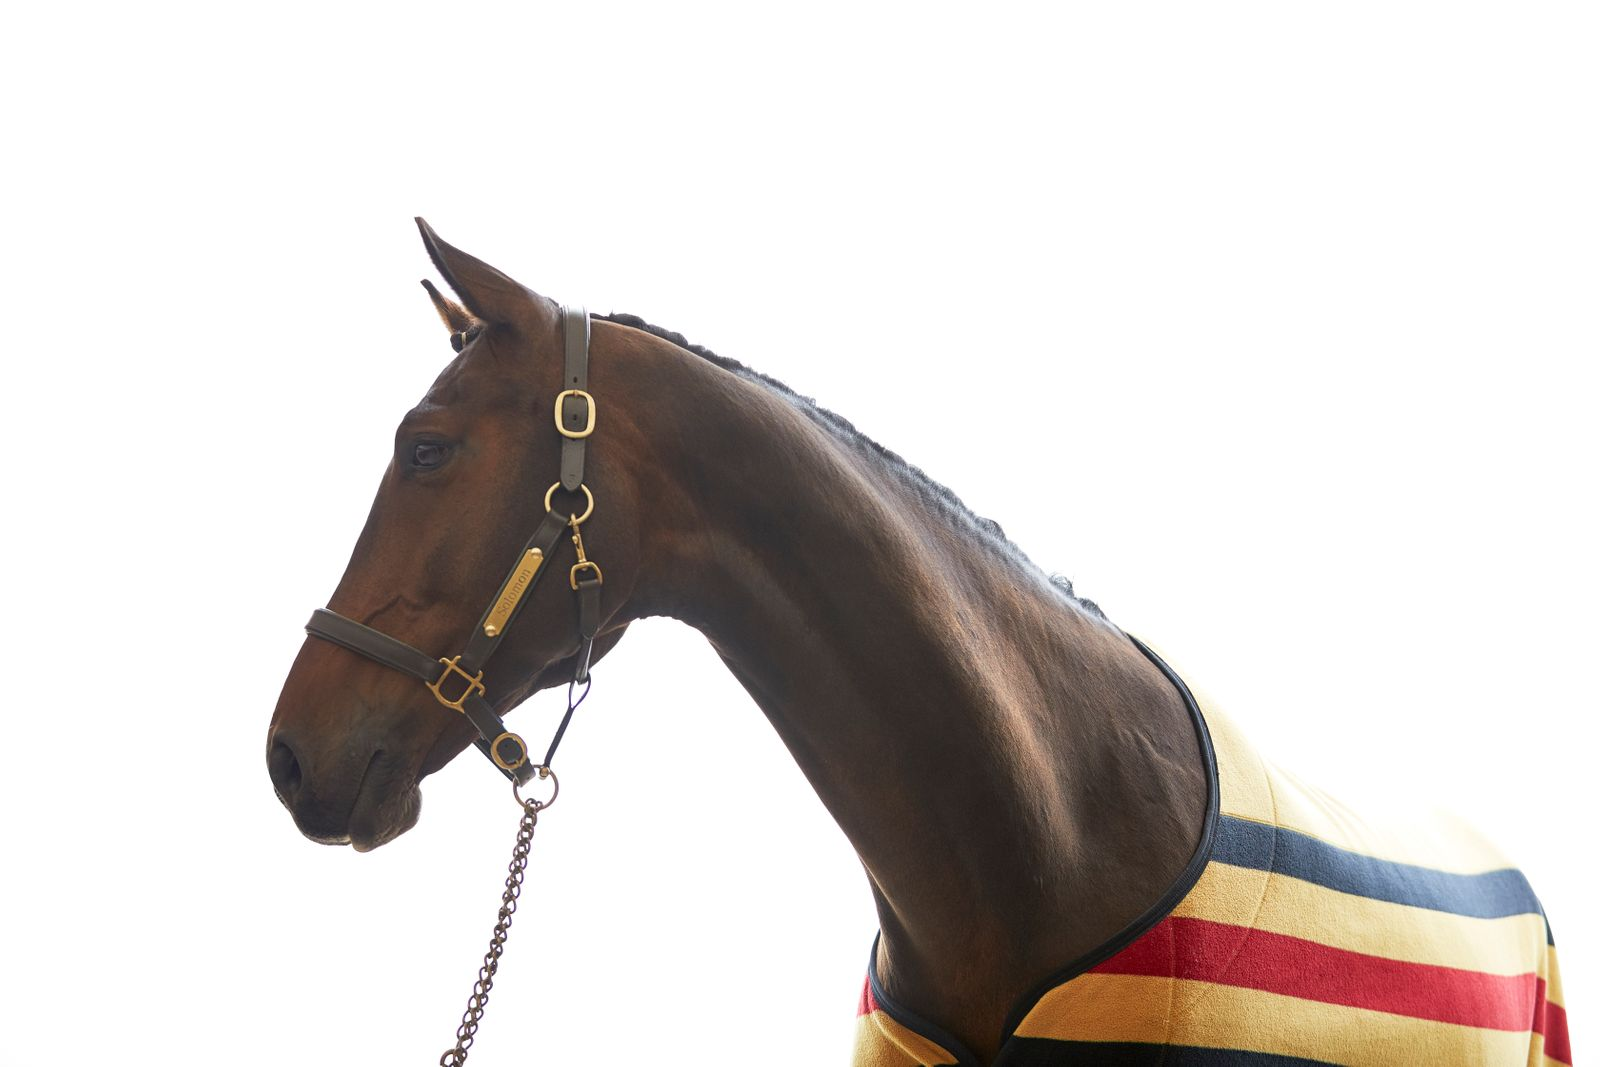 JR_NBH_Dressage_Horse_091318_1367.jpg